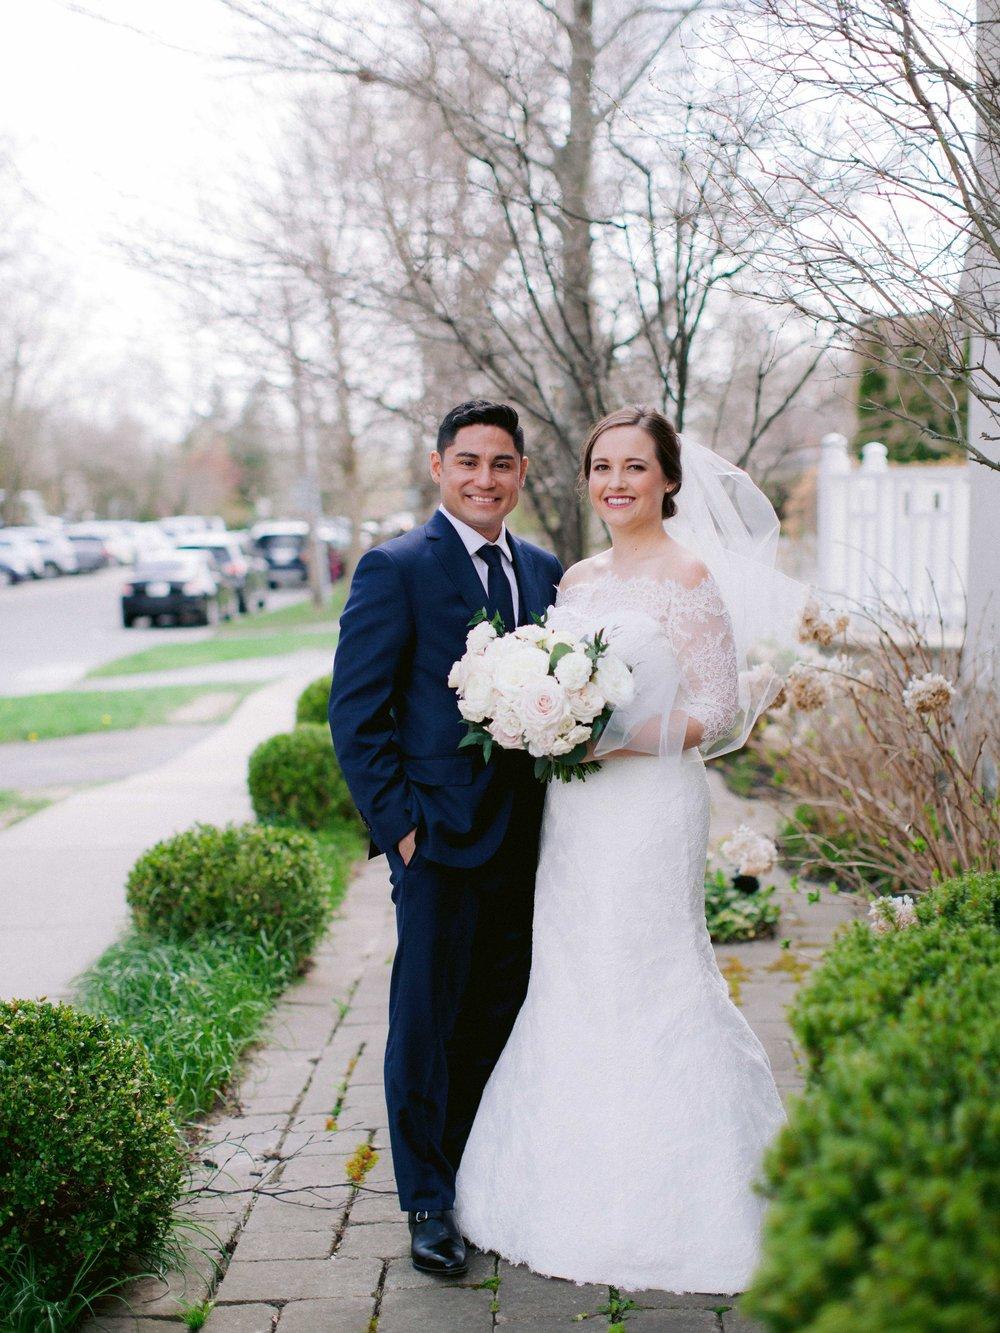 Niagara_on_the_lake_spring_wedding_kurtz_orpia_toronto_Vineyard_wedding_fine_art (52 of 92).jpg